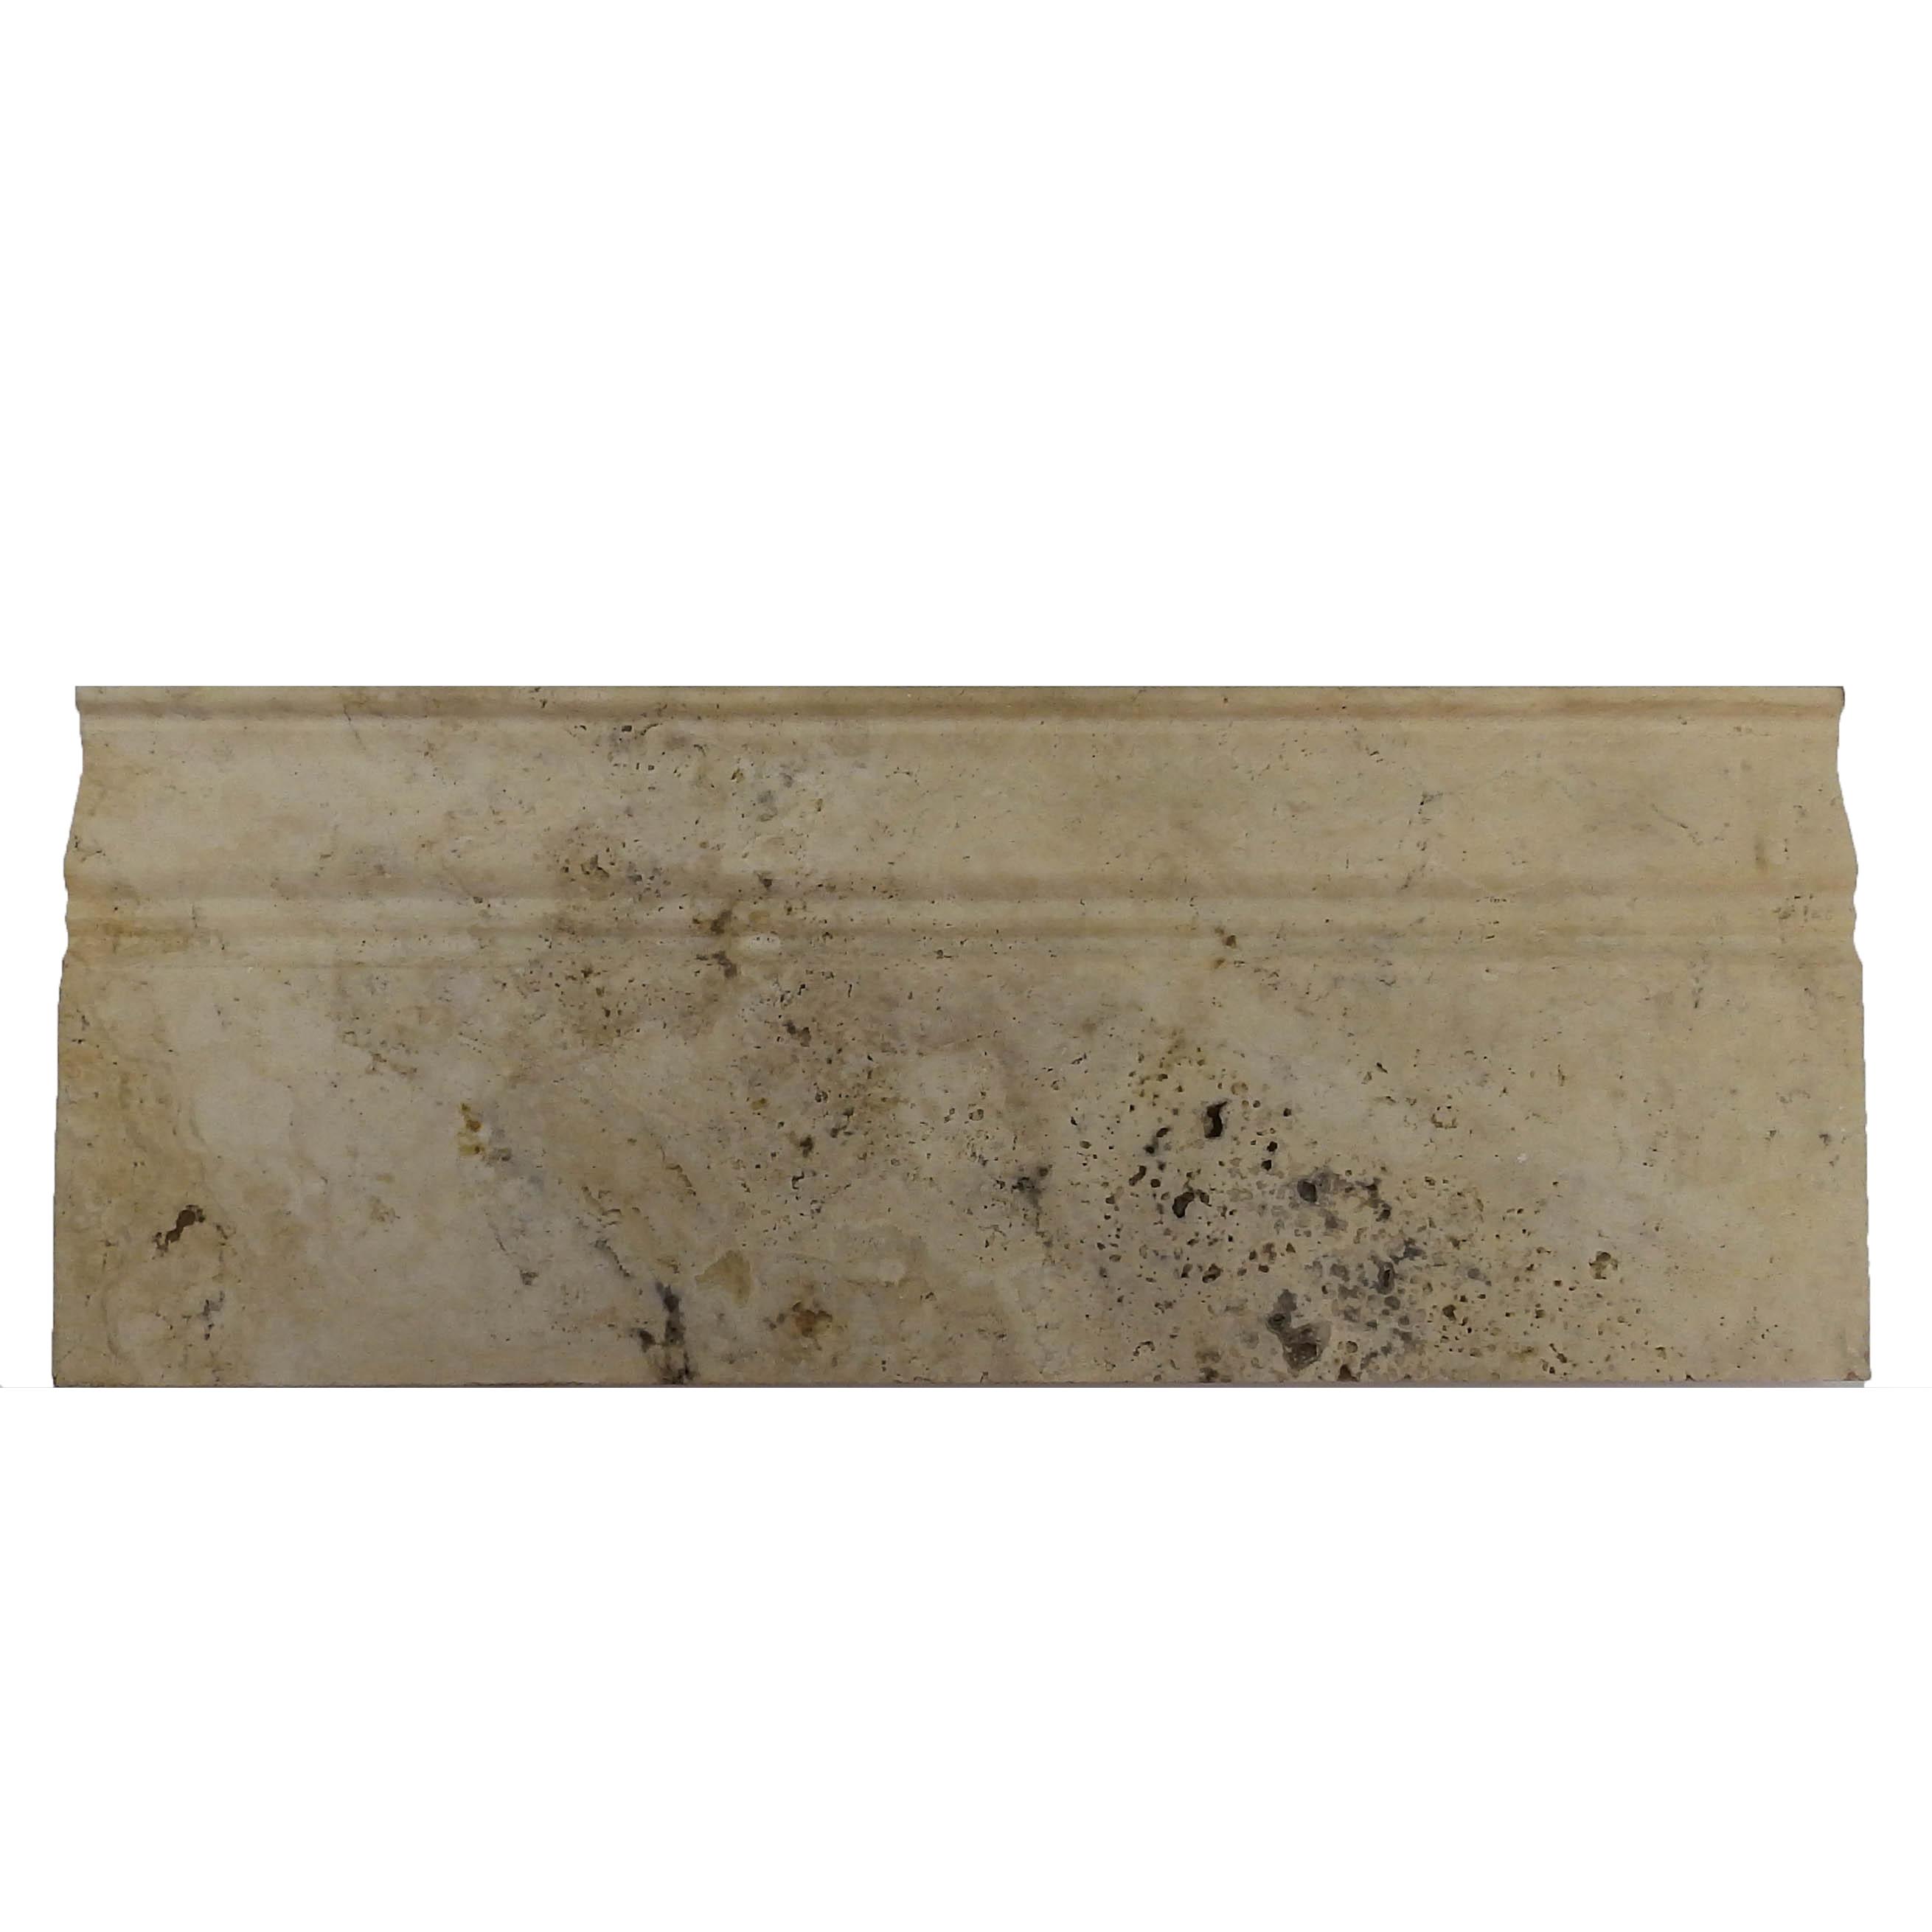 Item #6170 - Philadelphia Travertine Molding Image